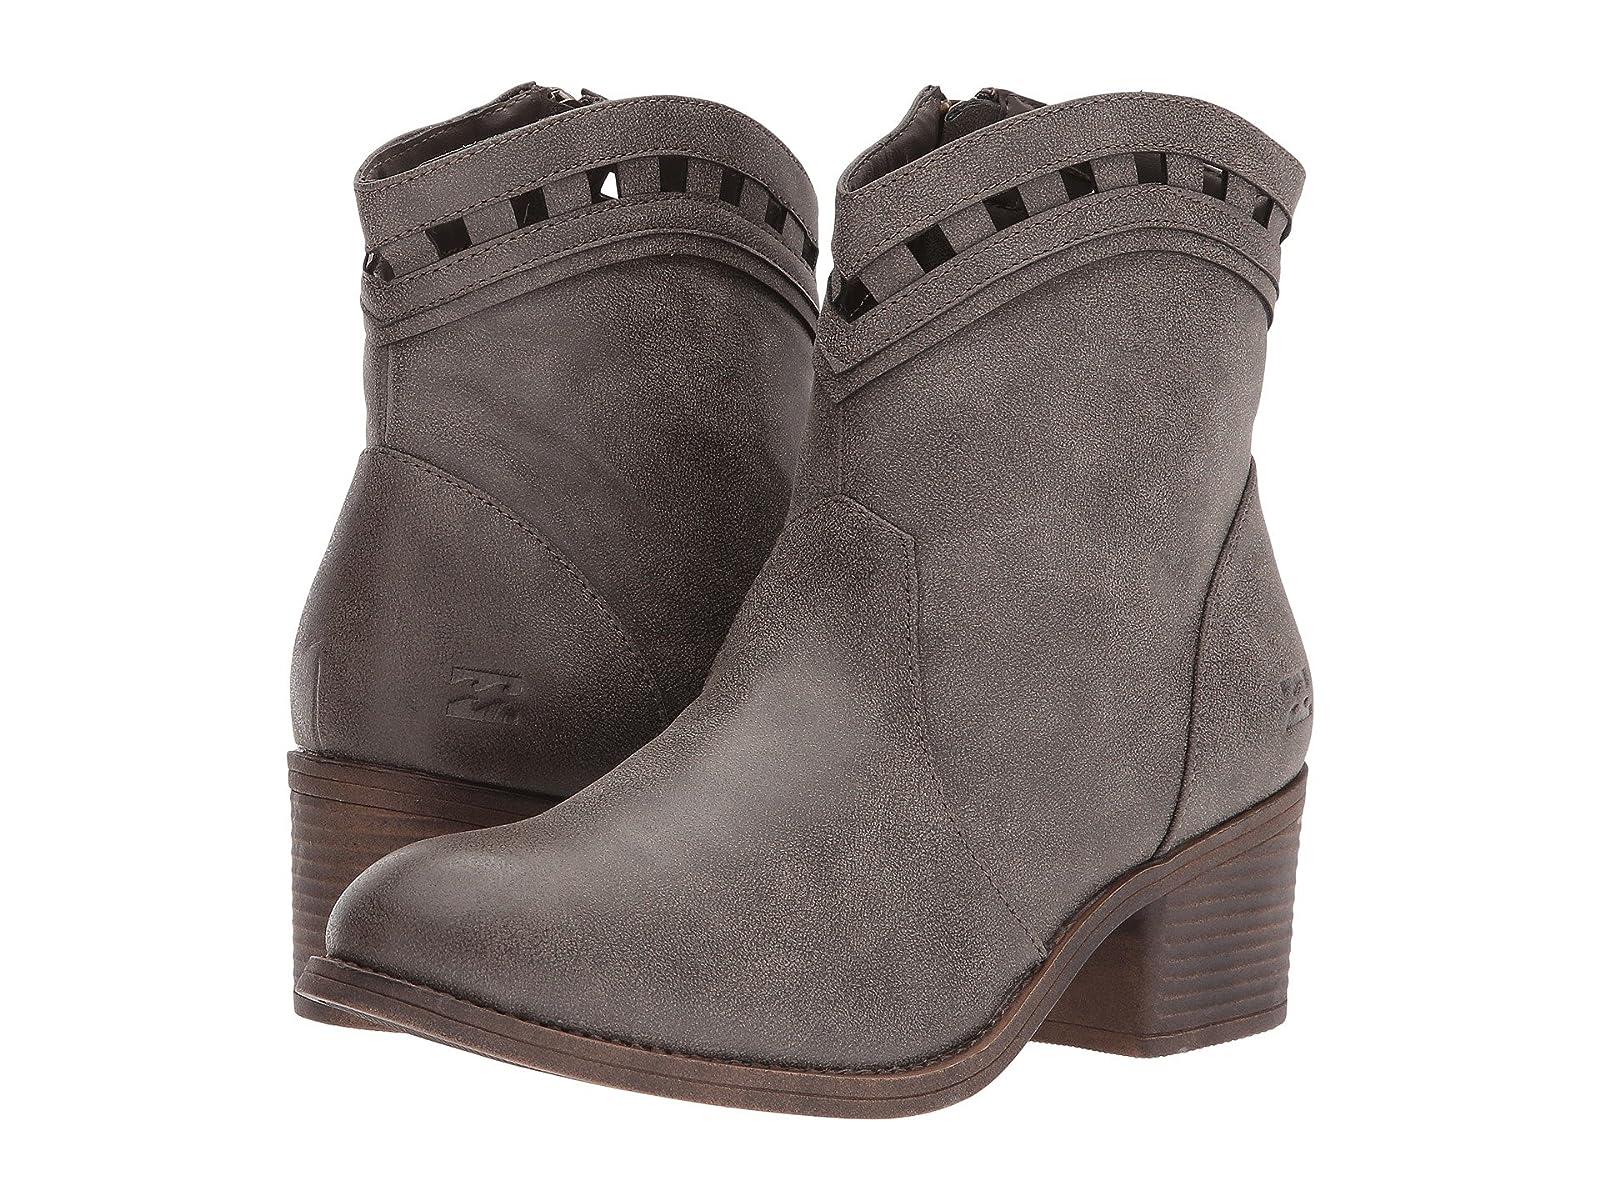 Billabong JostSelling fashionable and eye-catching shoes